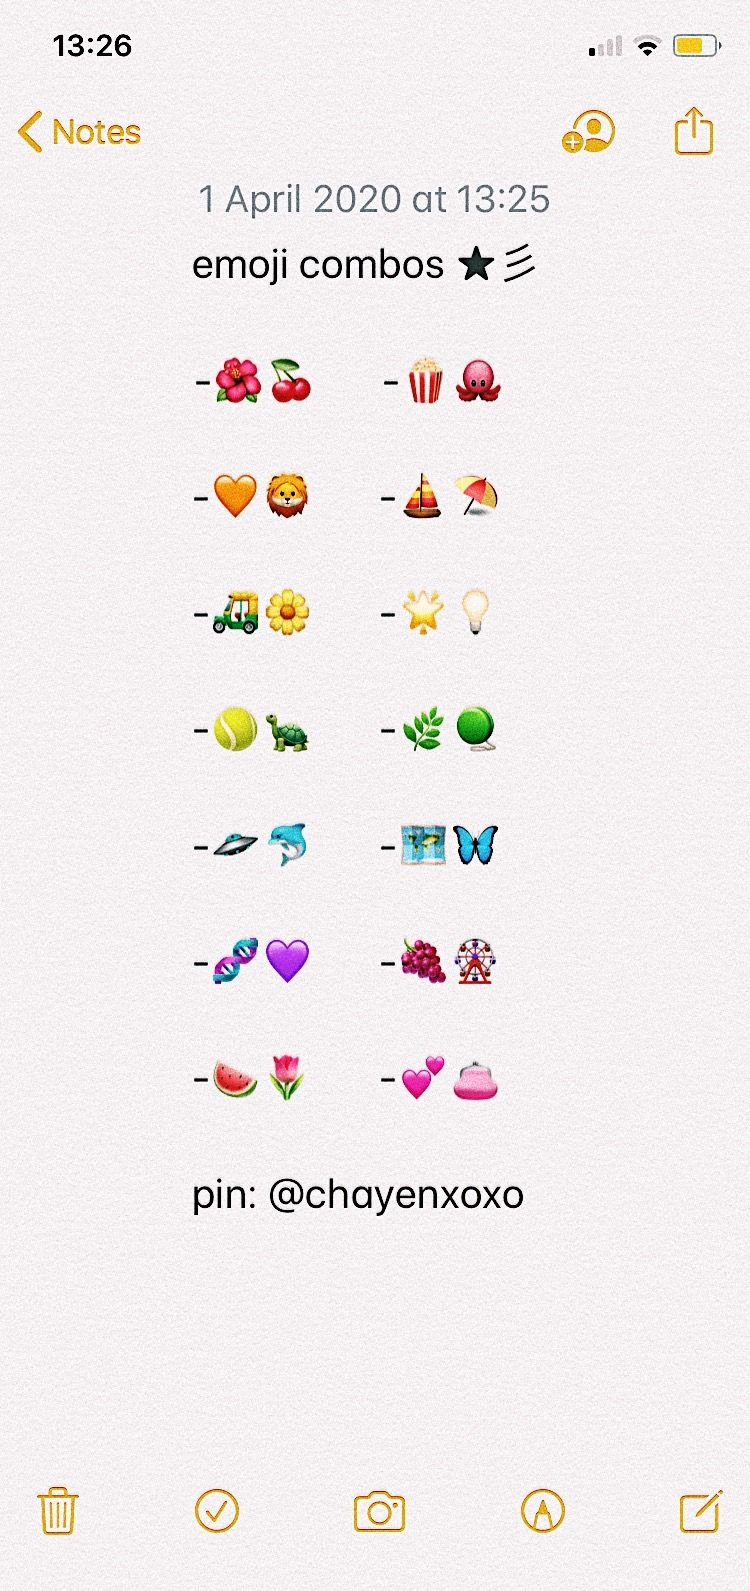 Emoji Combos In 2020 Emoji Combinations Cute Emoji Combinations Instagram Emoji